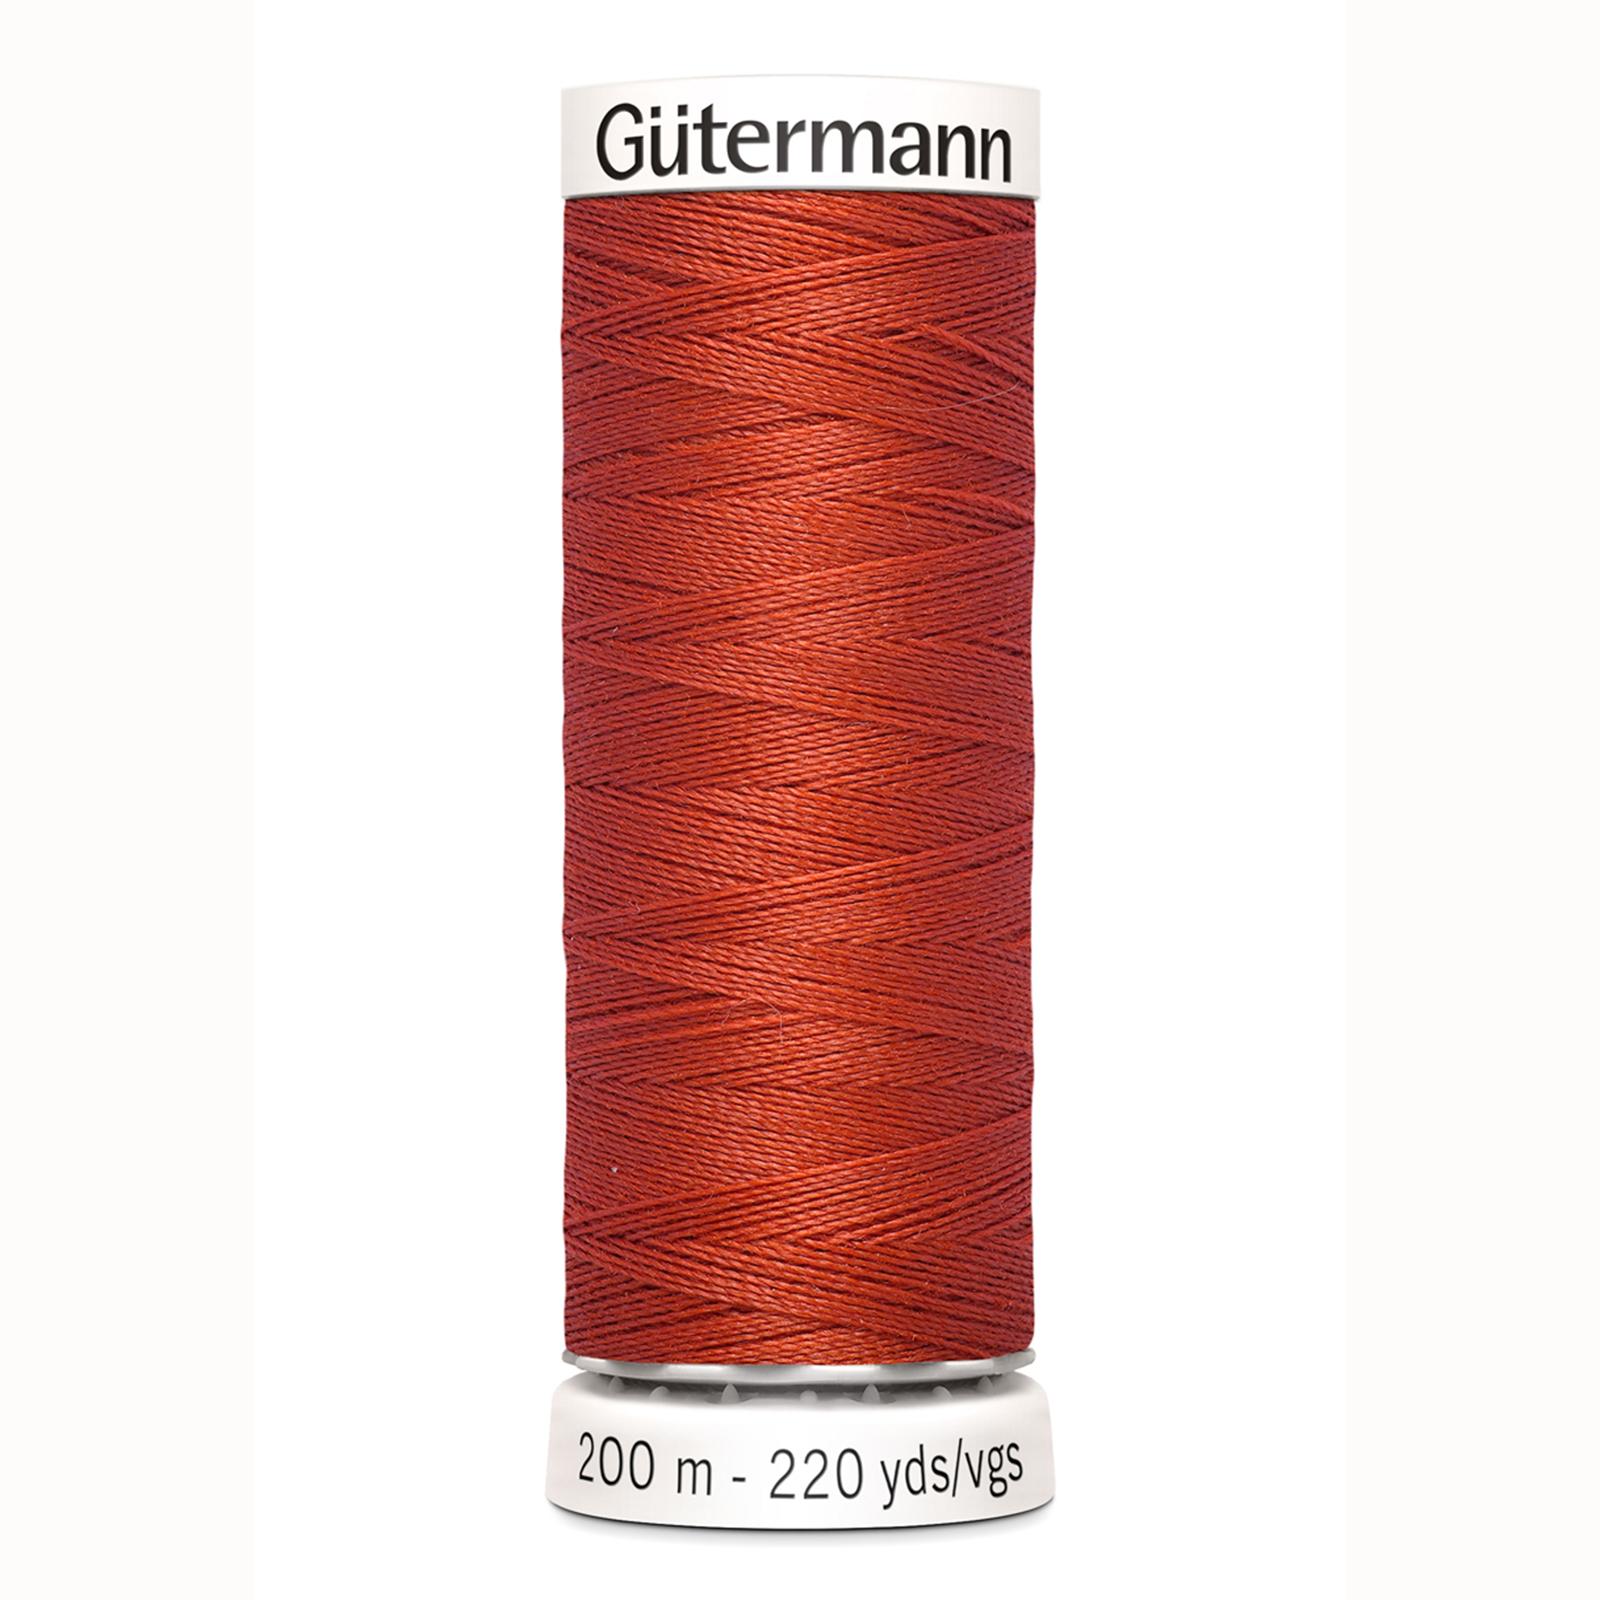 Gutermann Polyestr 200m-589